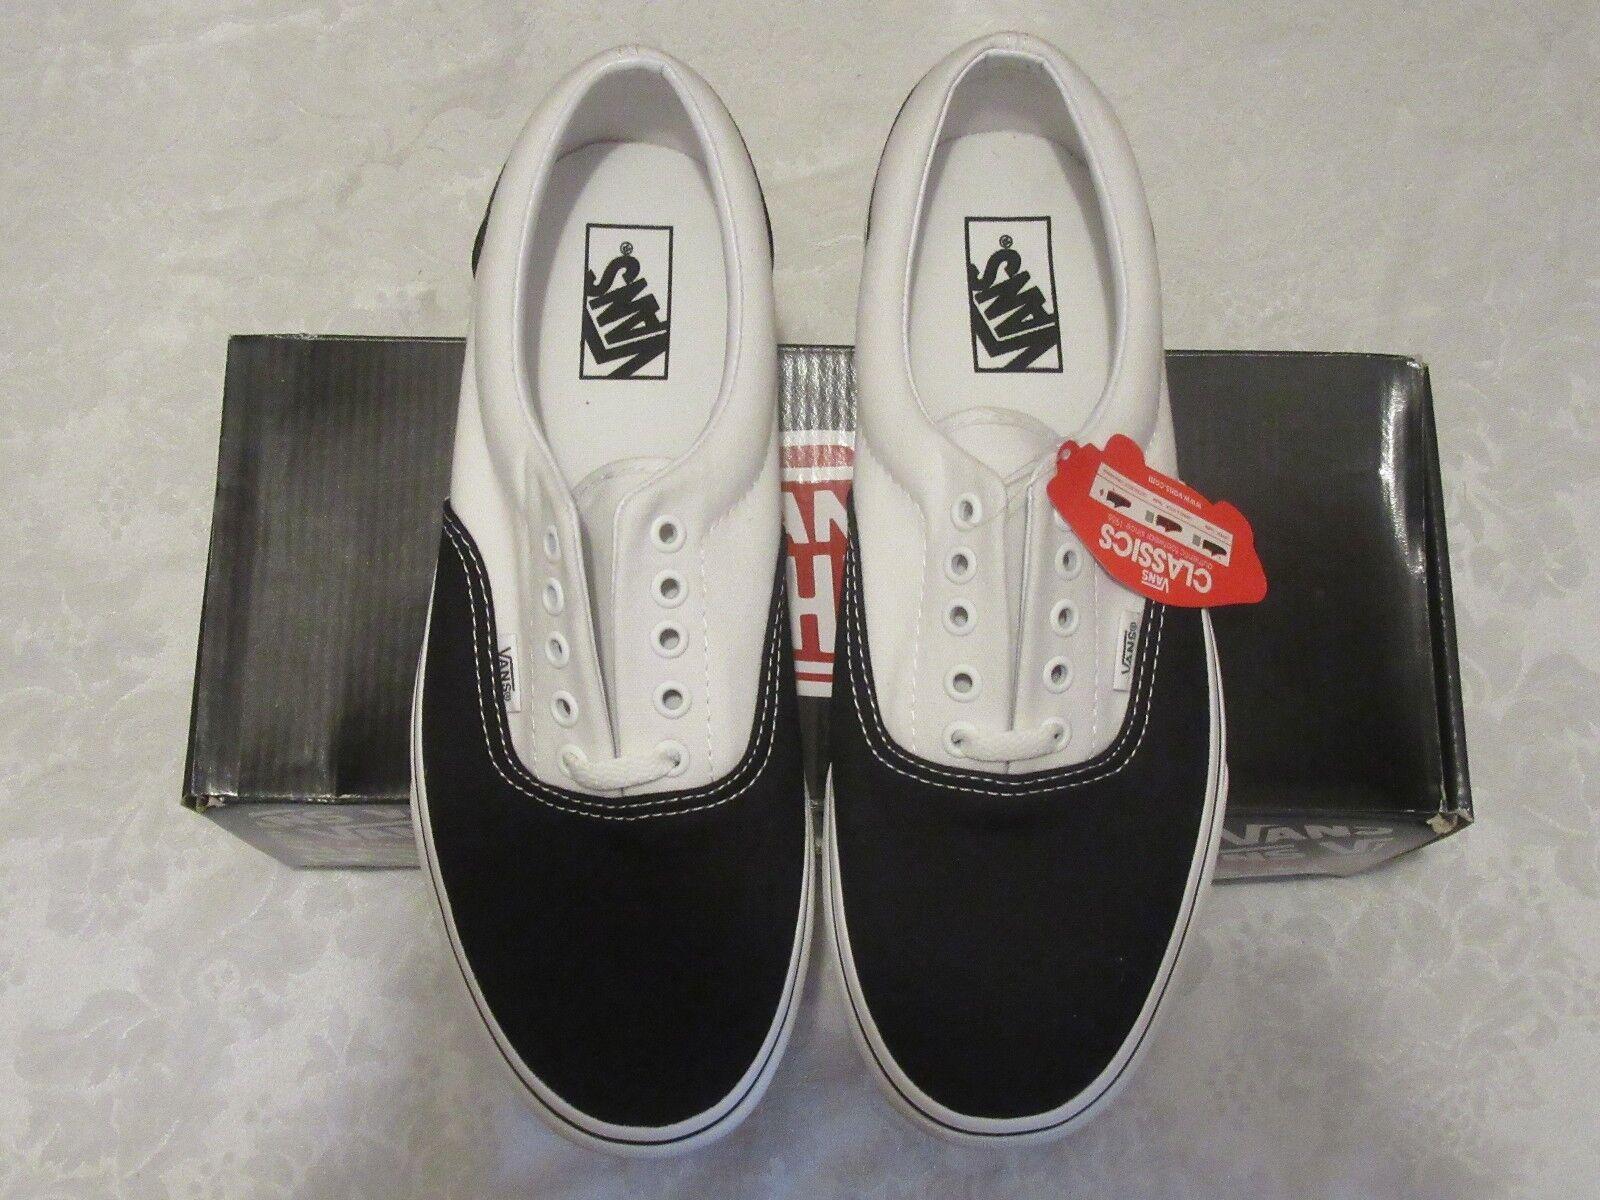 Vans Era Two Tone Black True White 00499581 VN-0EWZ4D8 Size 10.5 Sneakers